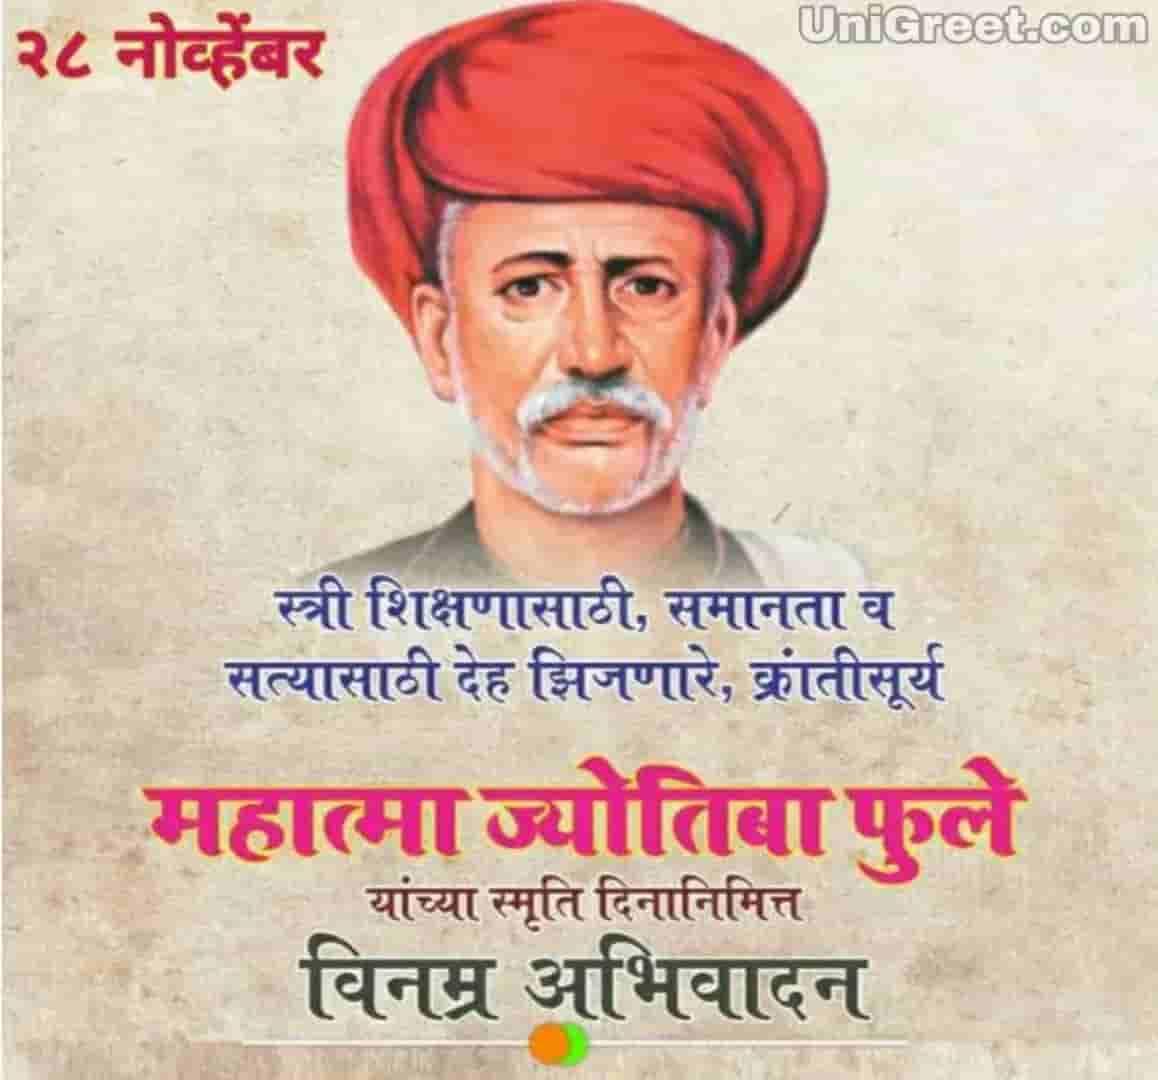 Best Mahatma Jyotiba Phule Punyatithi Images Quotes Status Download